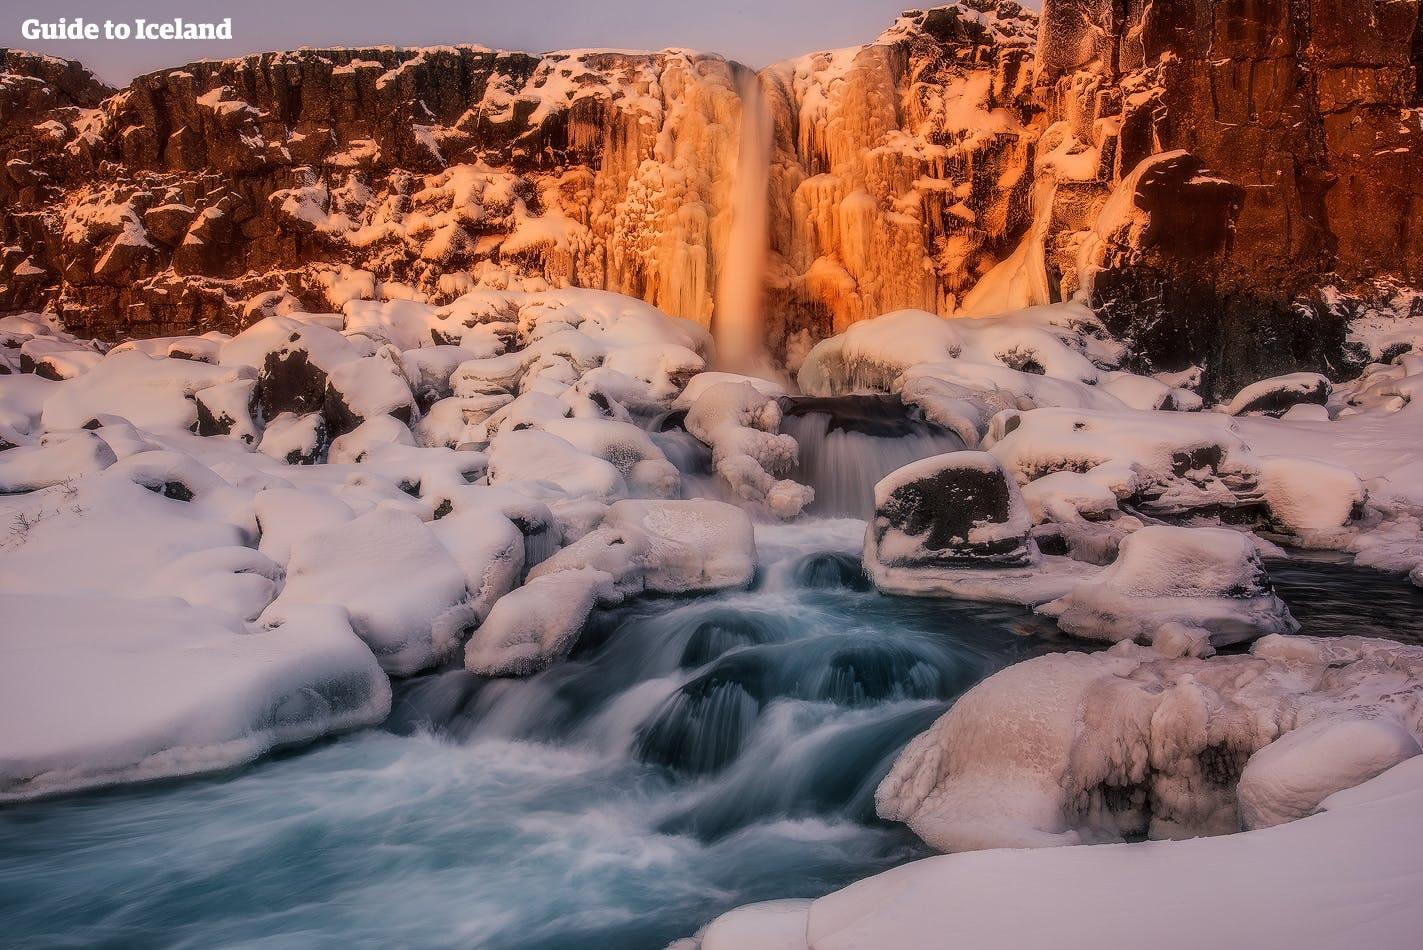 Der Wasserfall Öxárfoss im Thingvellir-Nationalpark am Golden Circle.